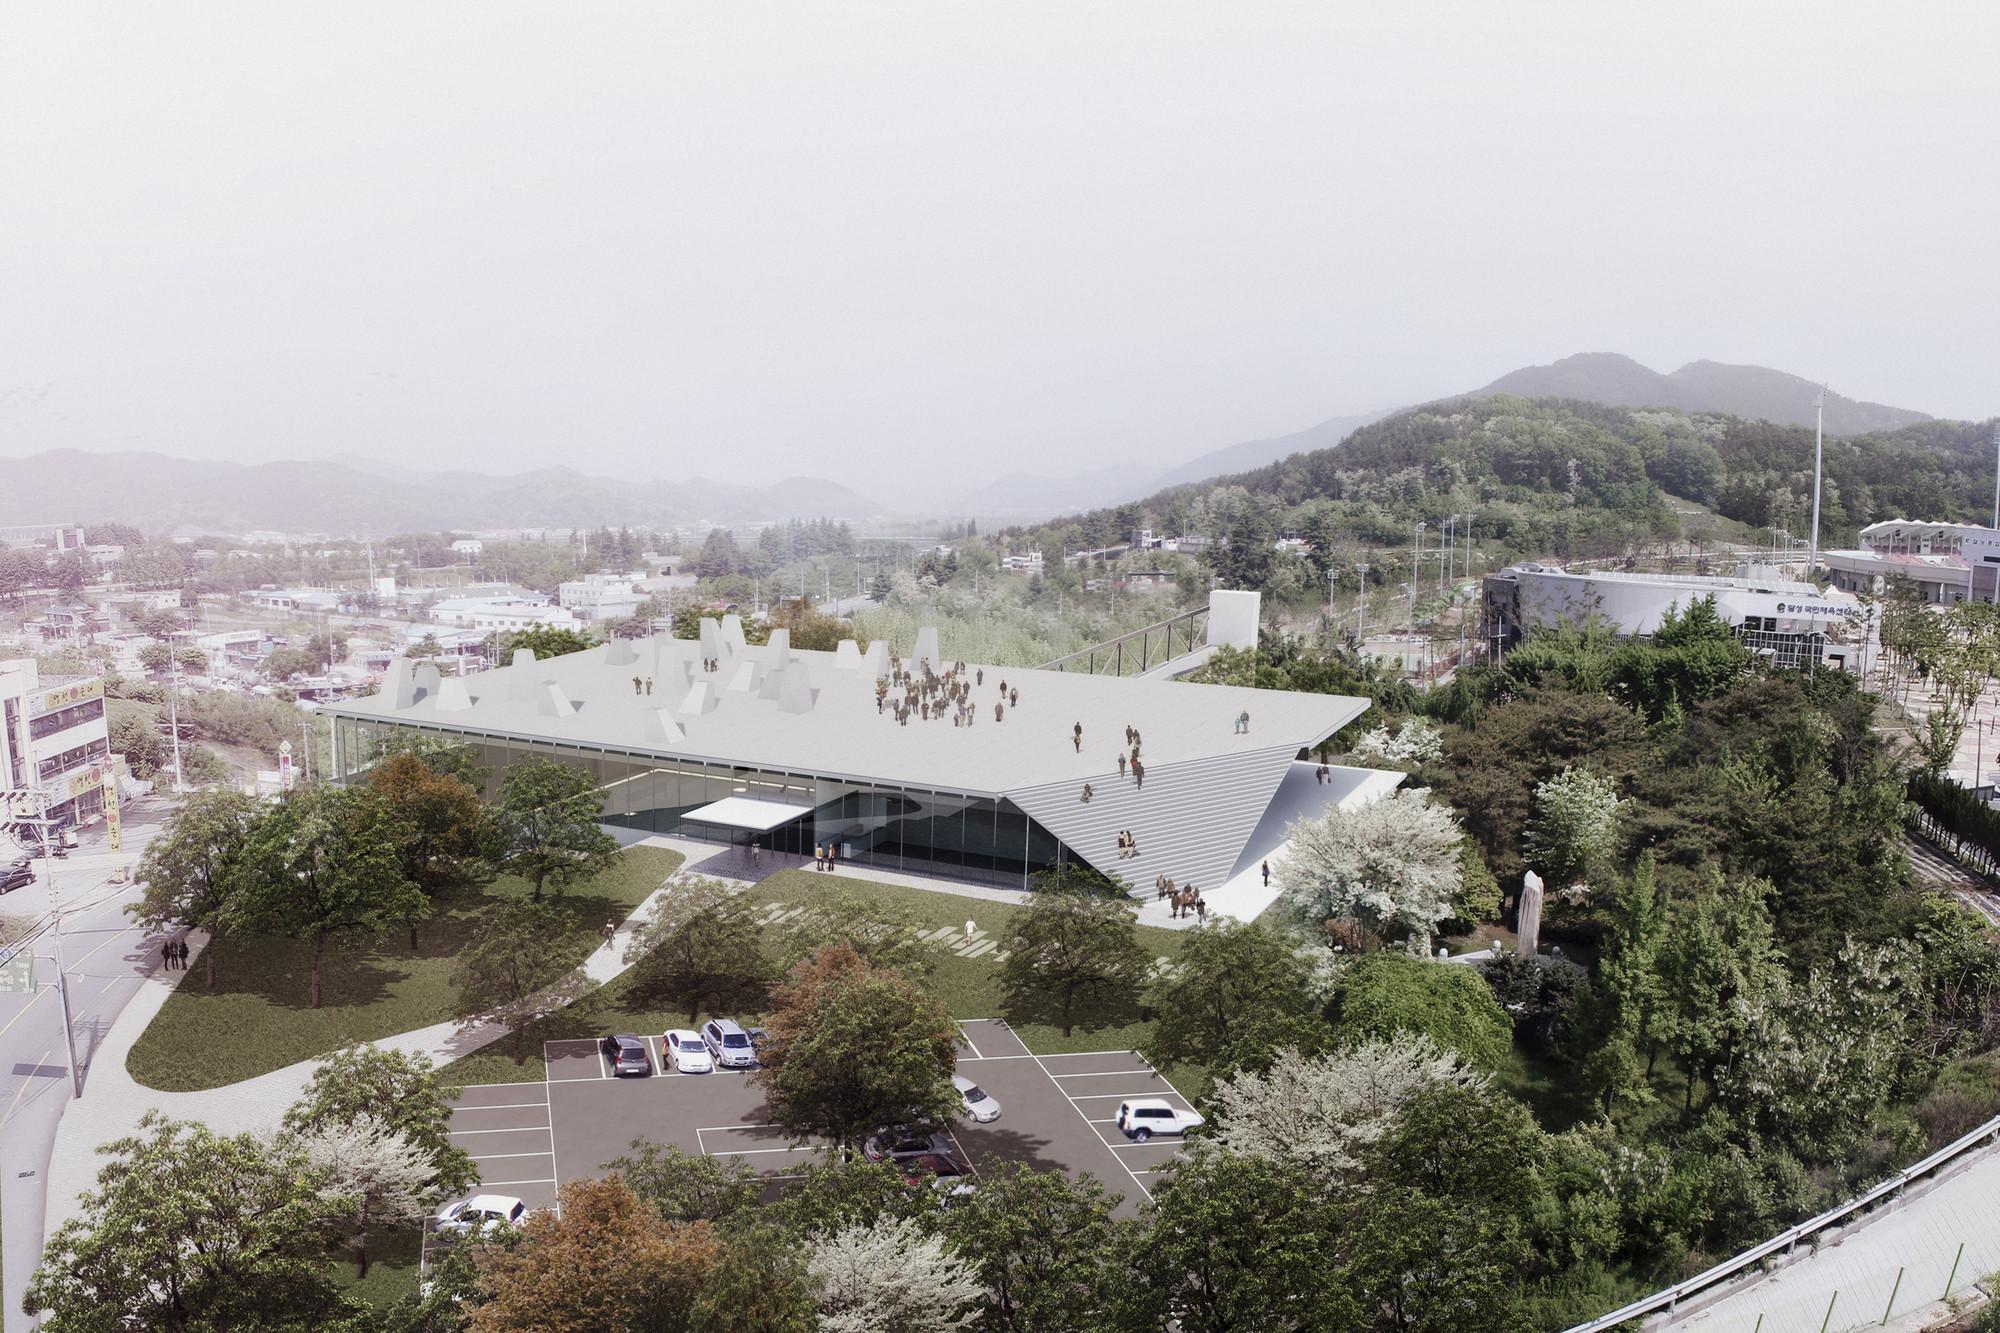 Competition Entry: Pedro Livni + Fernando De Rossa's Proposal for Dalseong Citizen's Gymnasium, © Pedro Livni + Fernando De Rossa